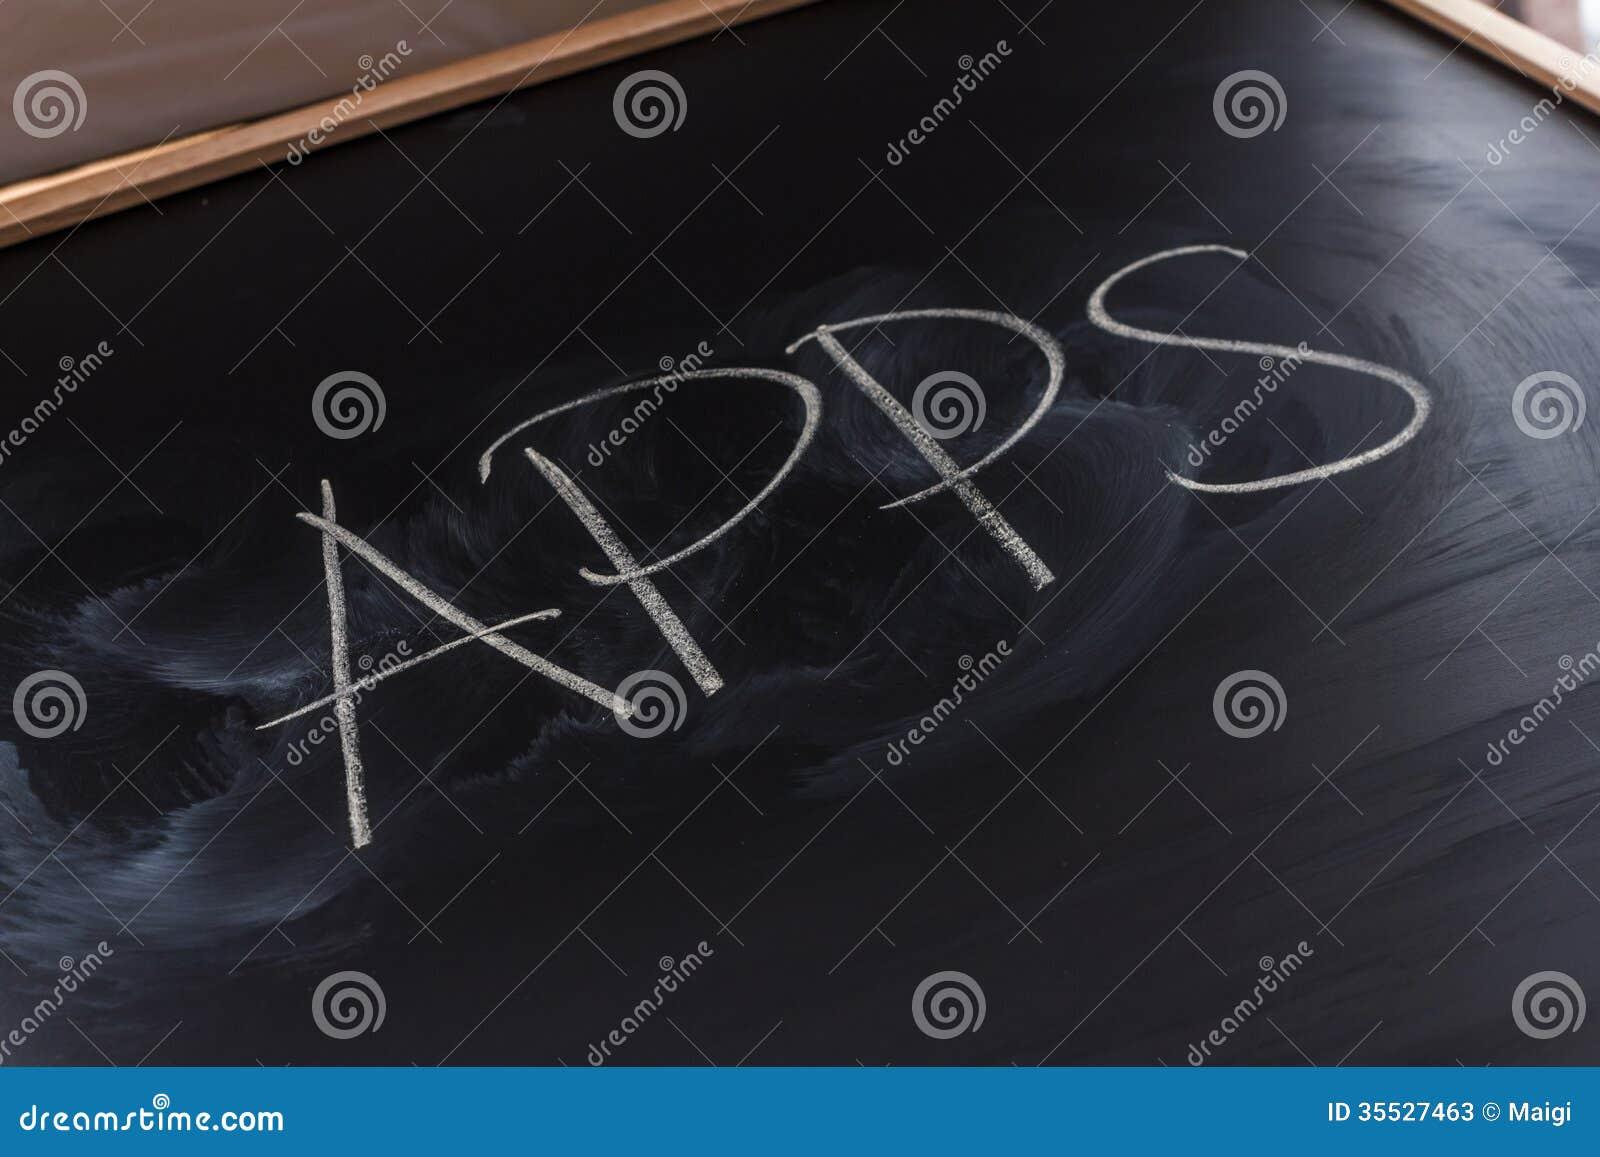 Chalk writing app